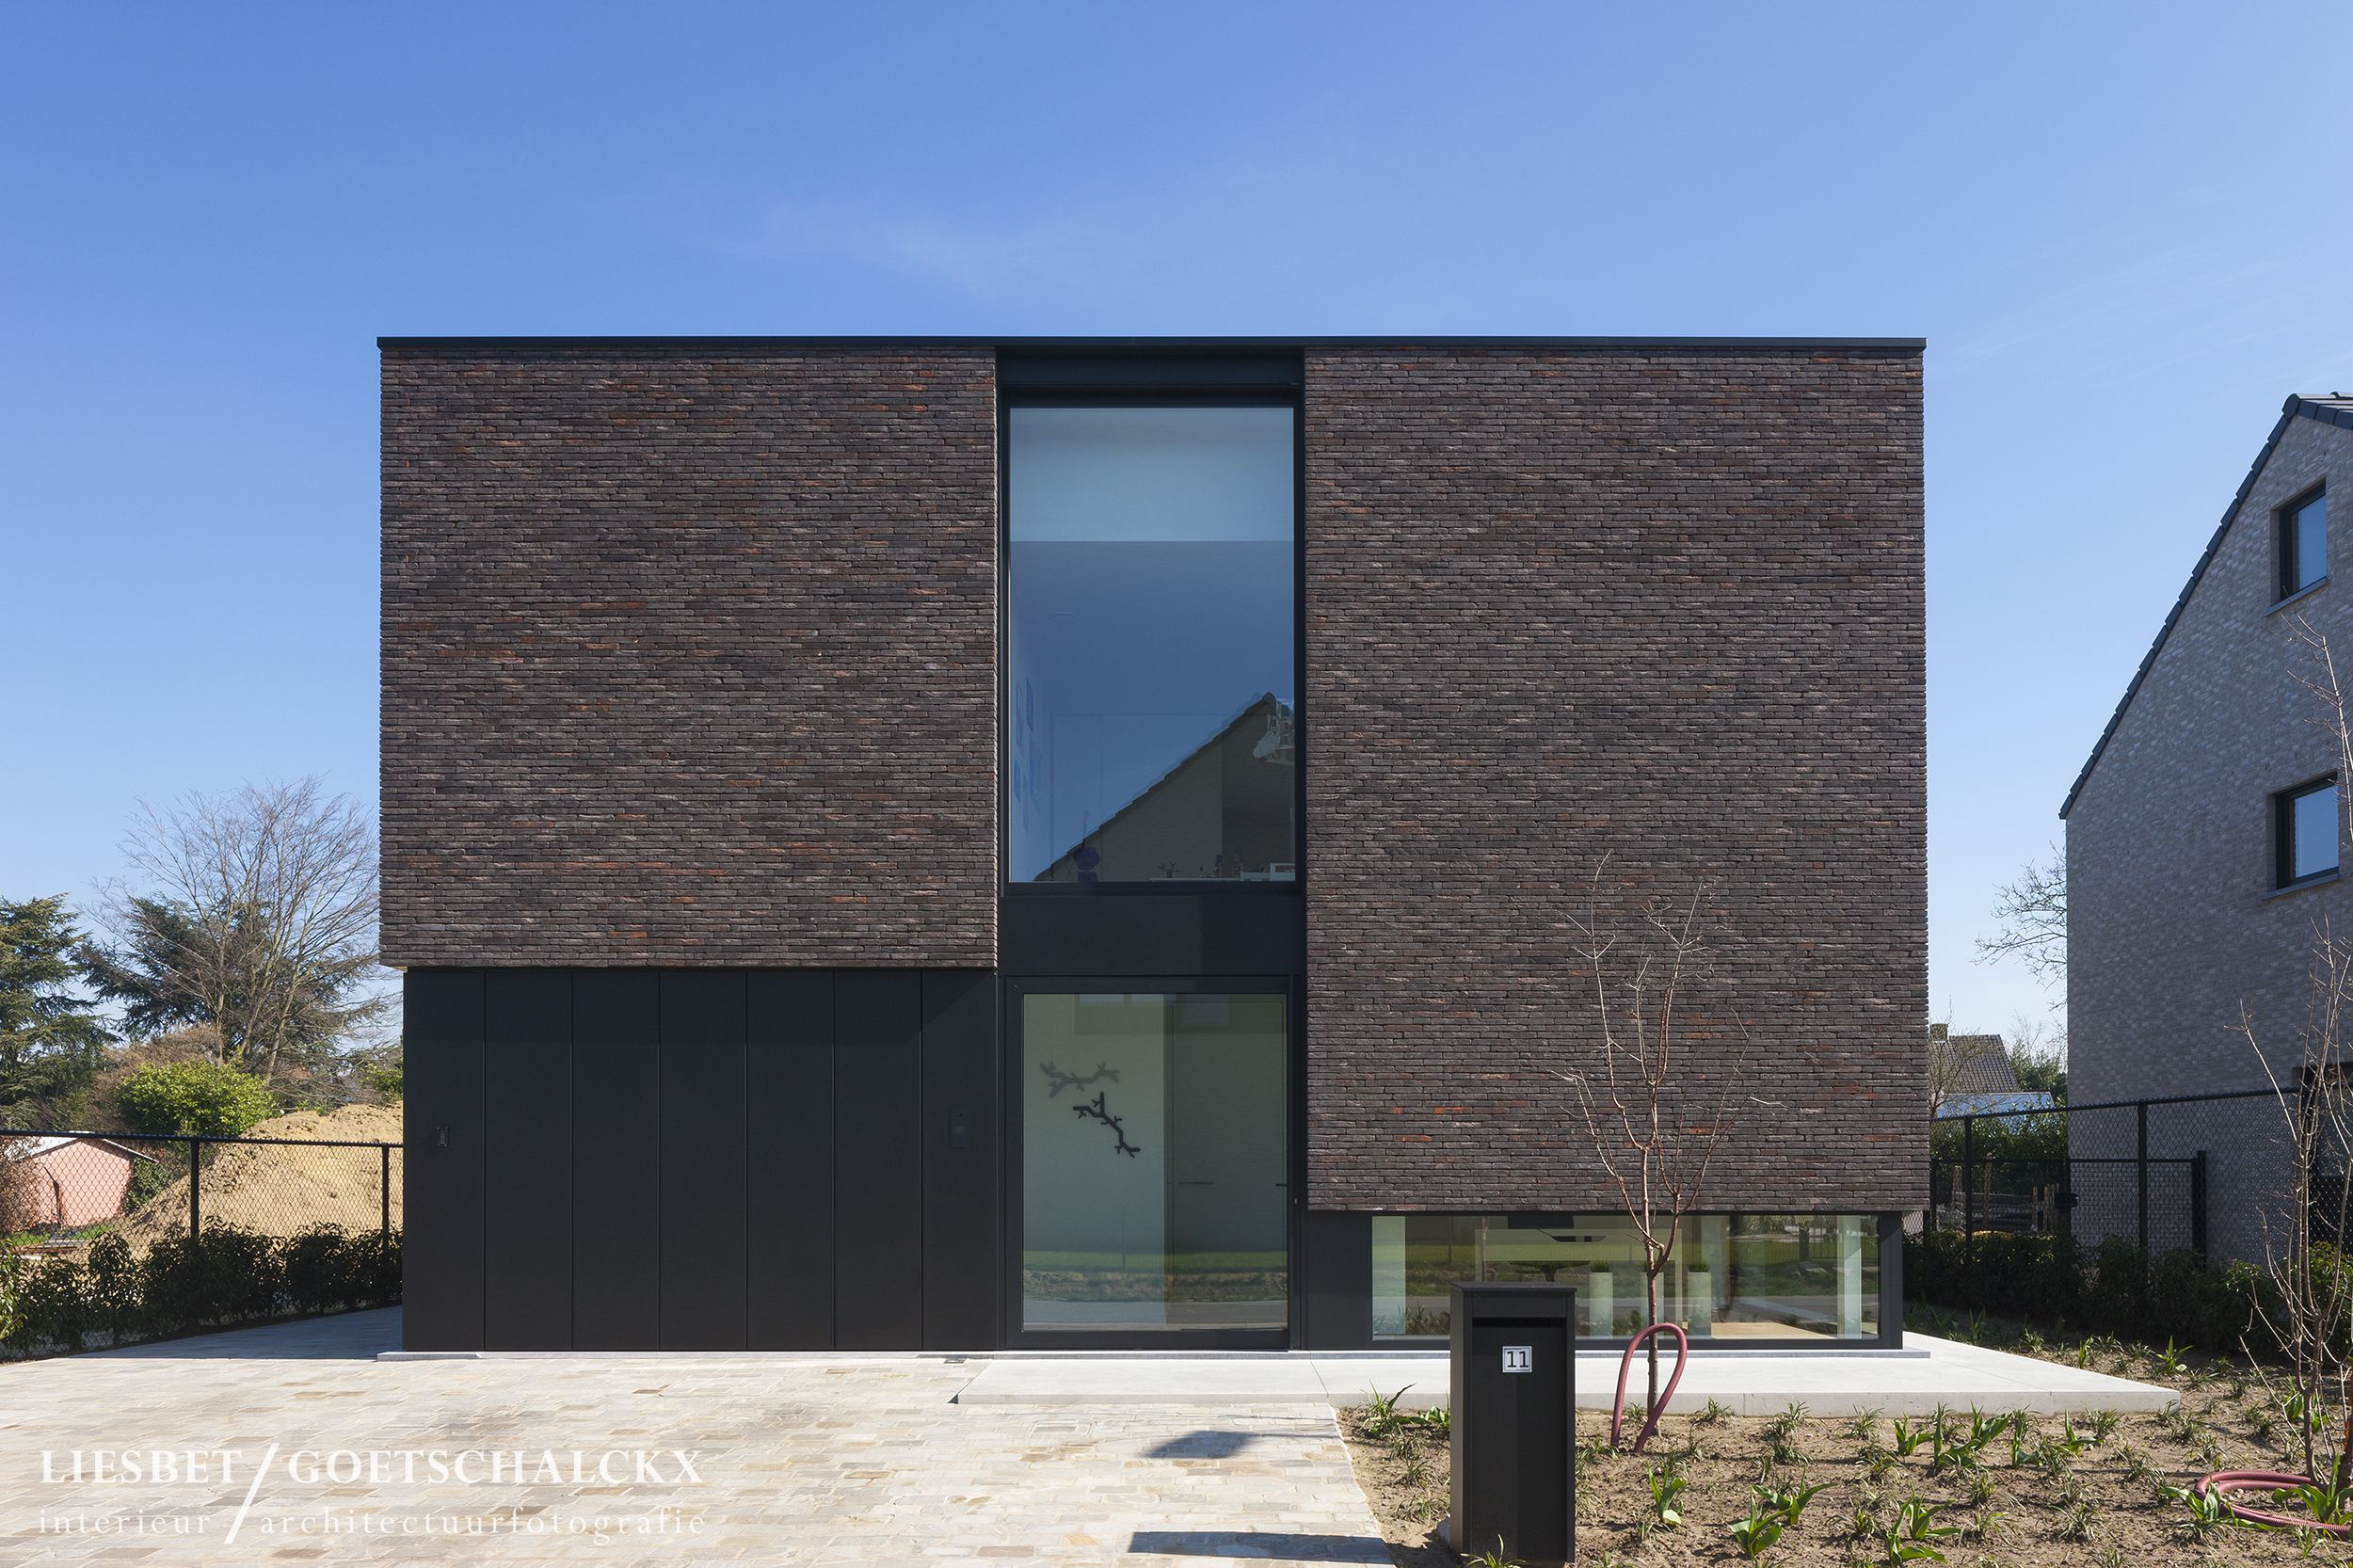 Vlakkenspel Gevel Woning Moderne Architectuur Woning Architectuur Huis